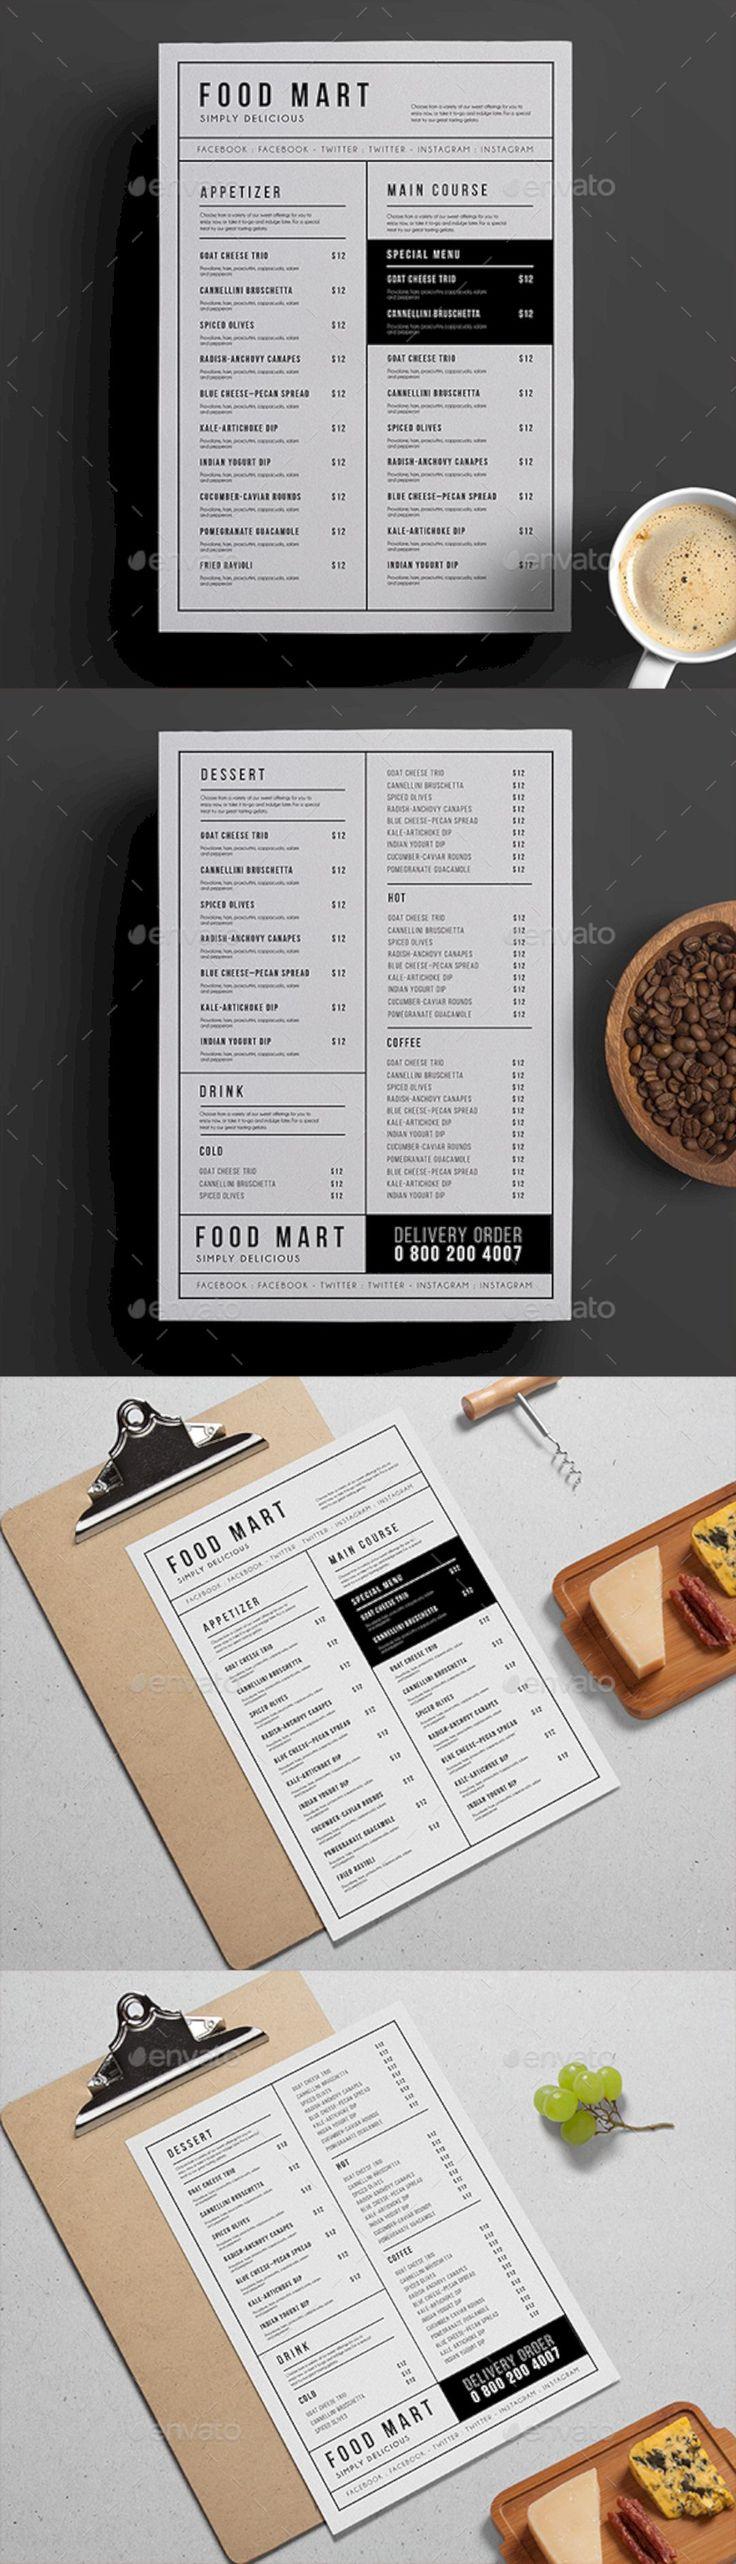 31 restaurant menu designs - Restaurant Menu Design Ideas